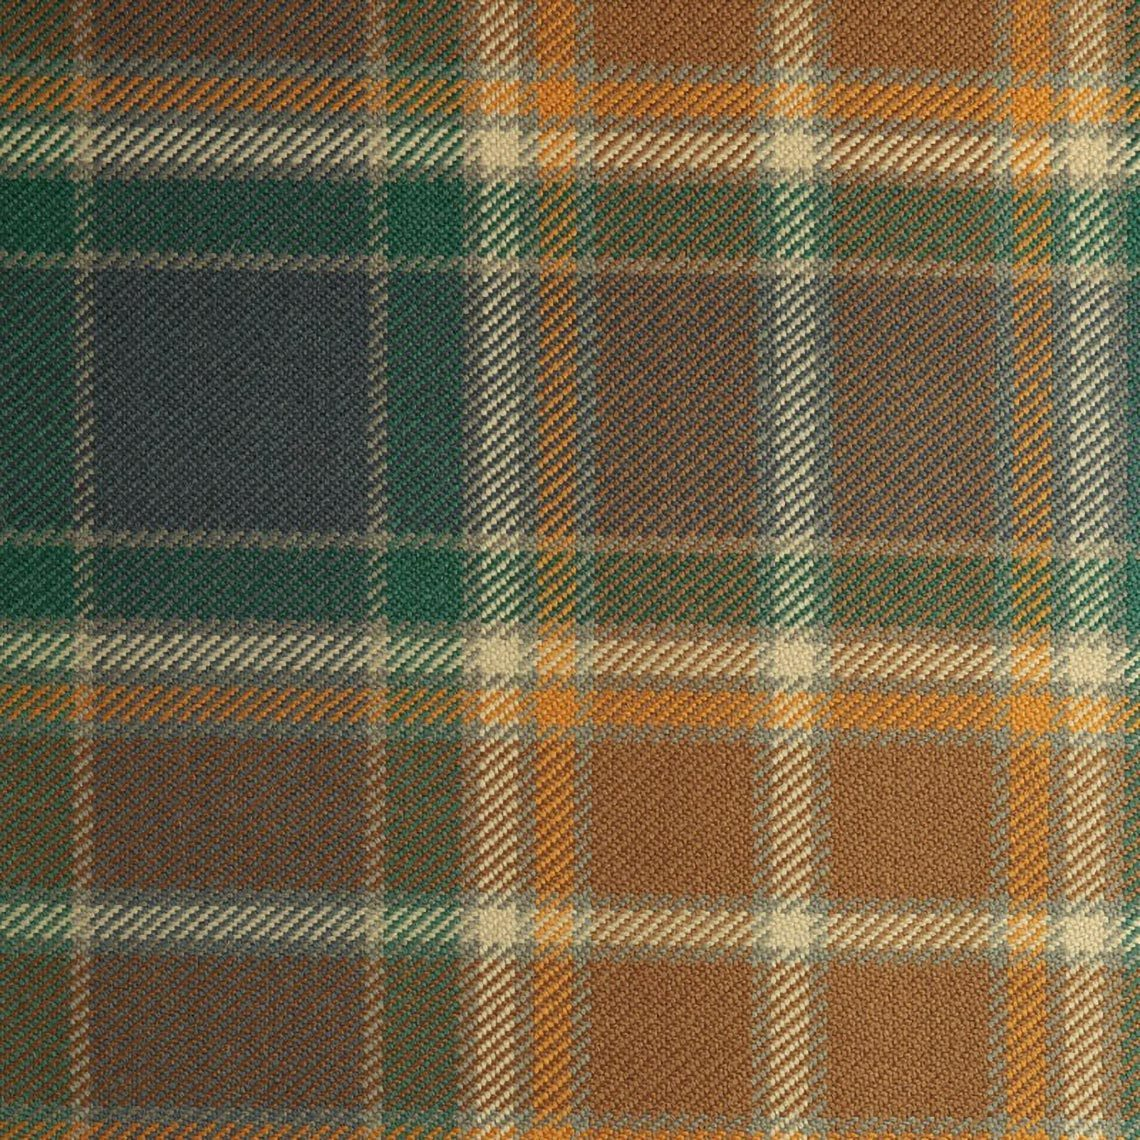 Manx (Hunting) Kilt